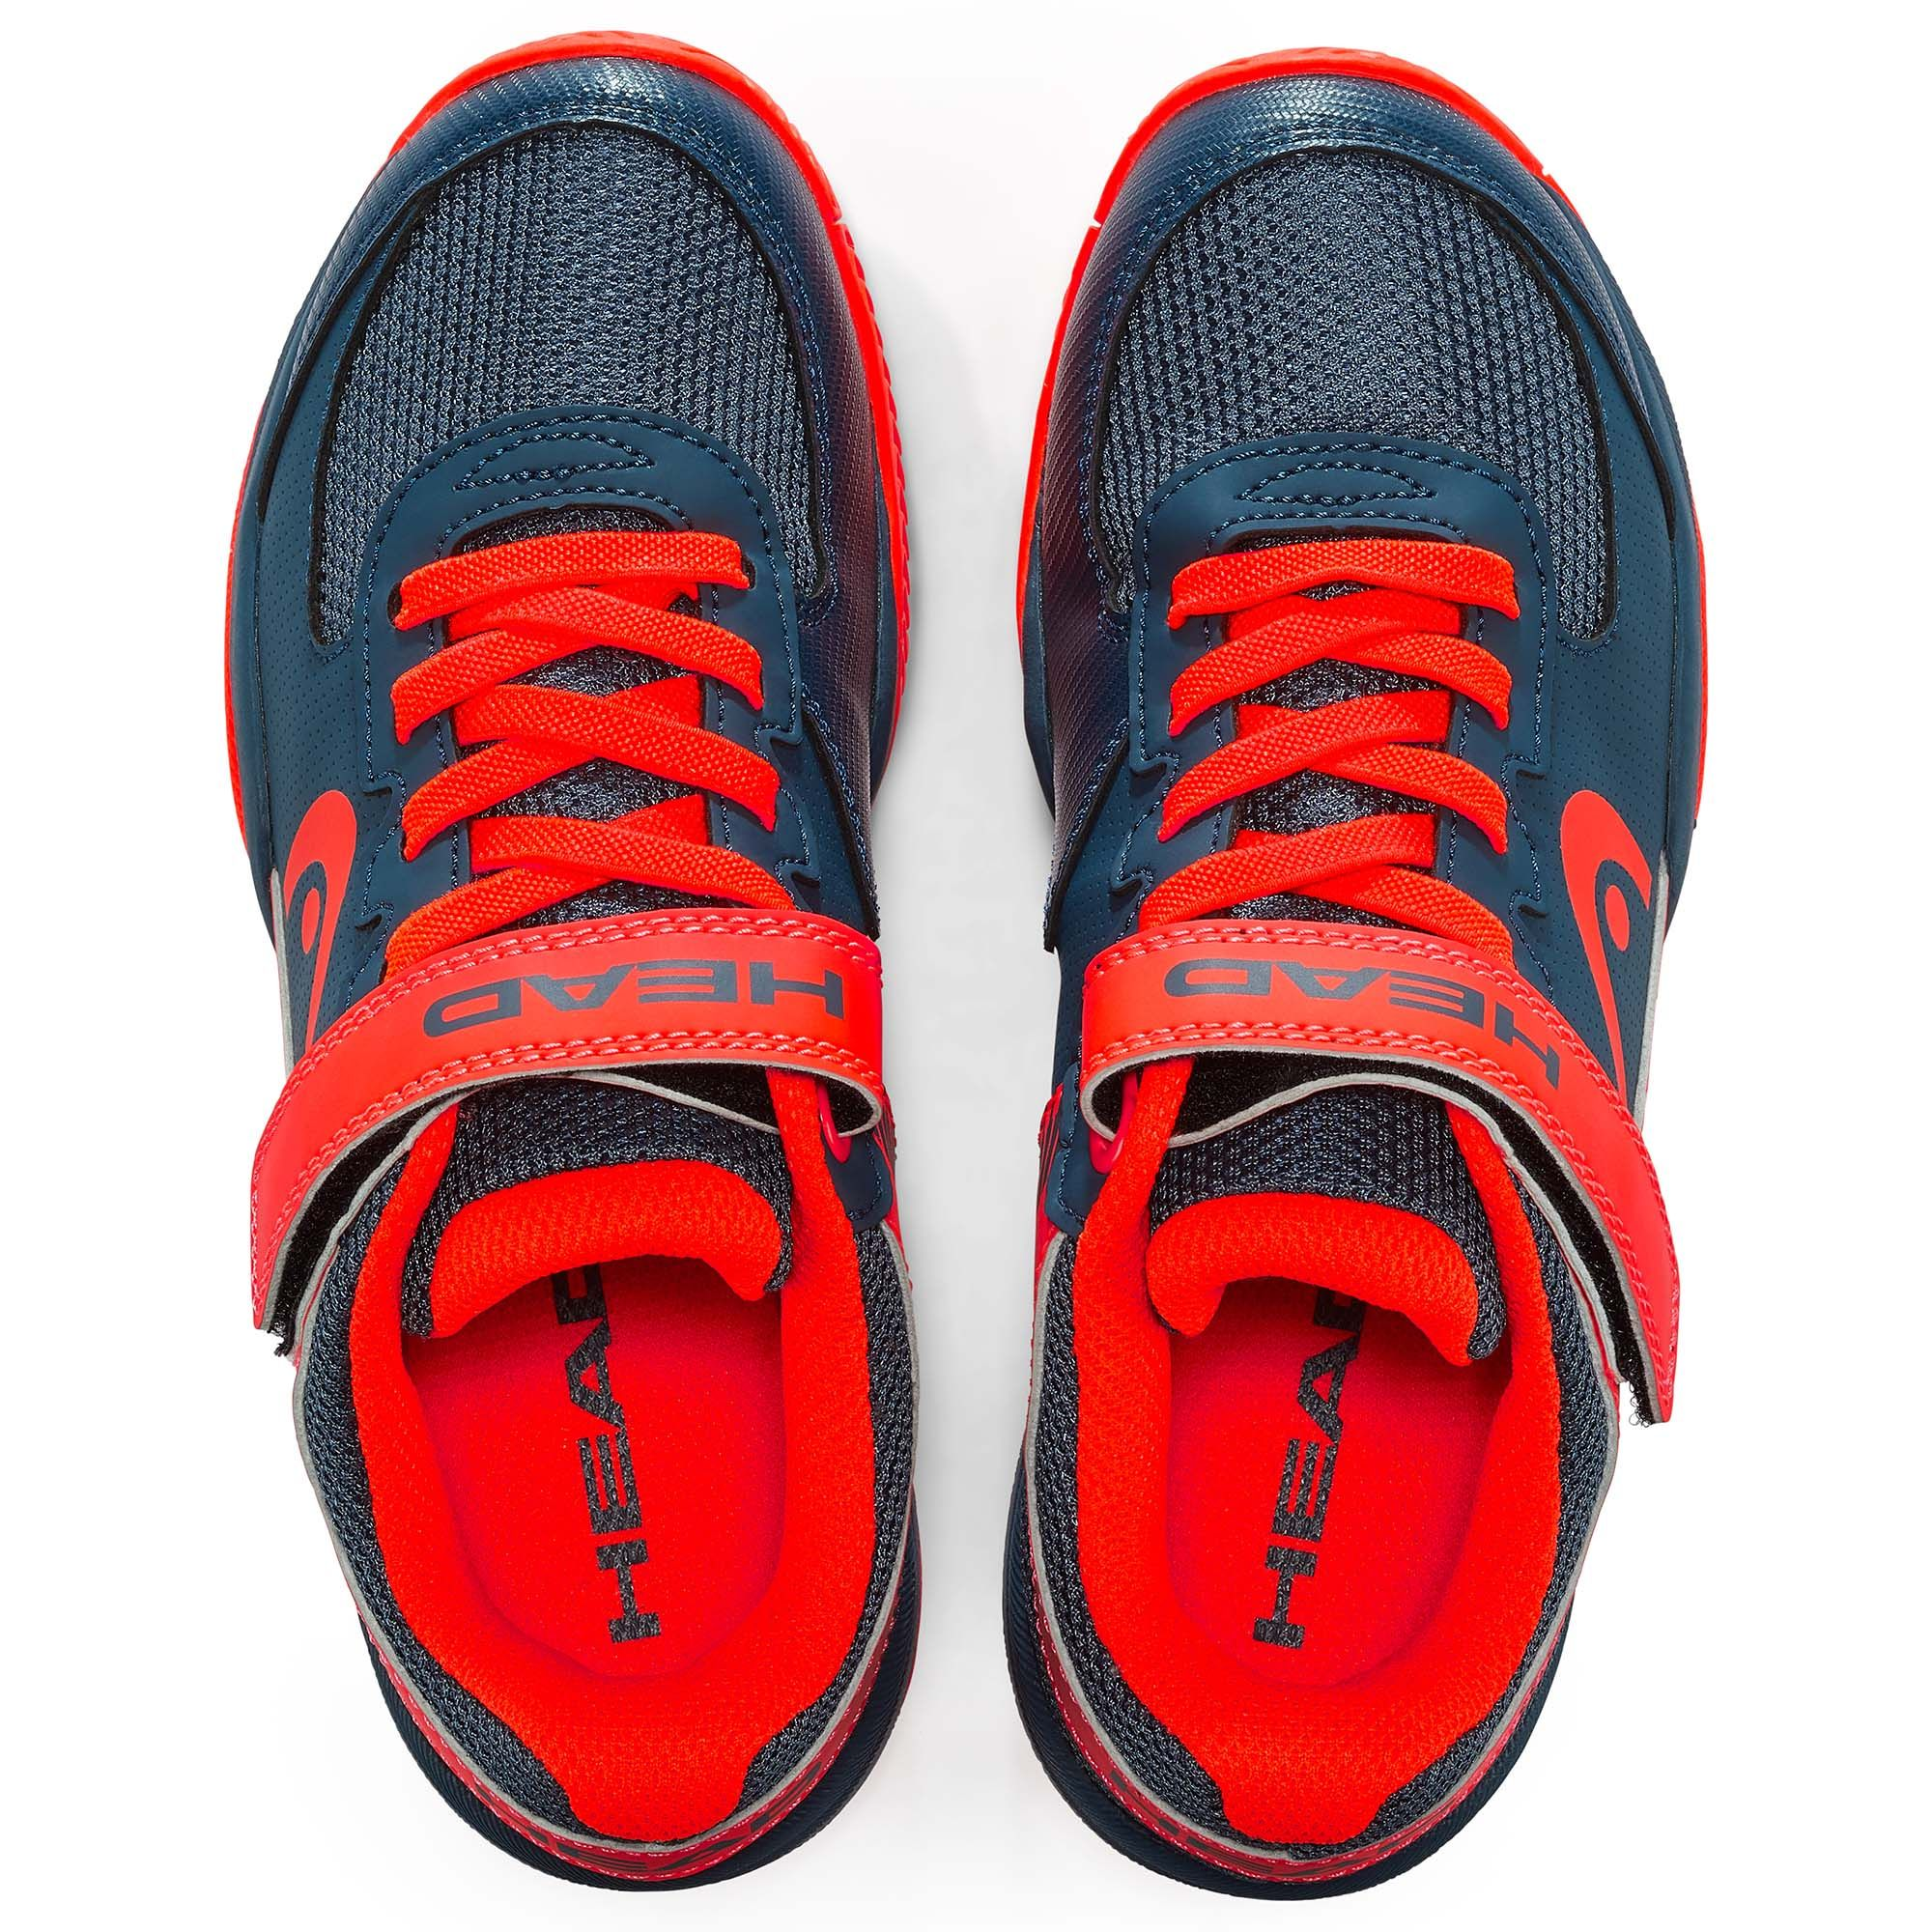 Asics Gel-Pulse 7 Ladies Running Shoes - Sweatband.com